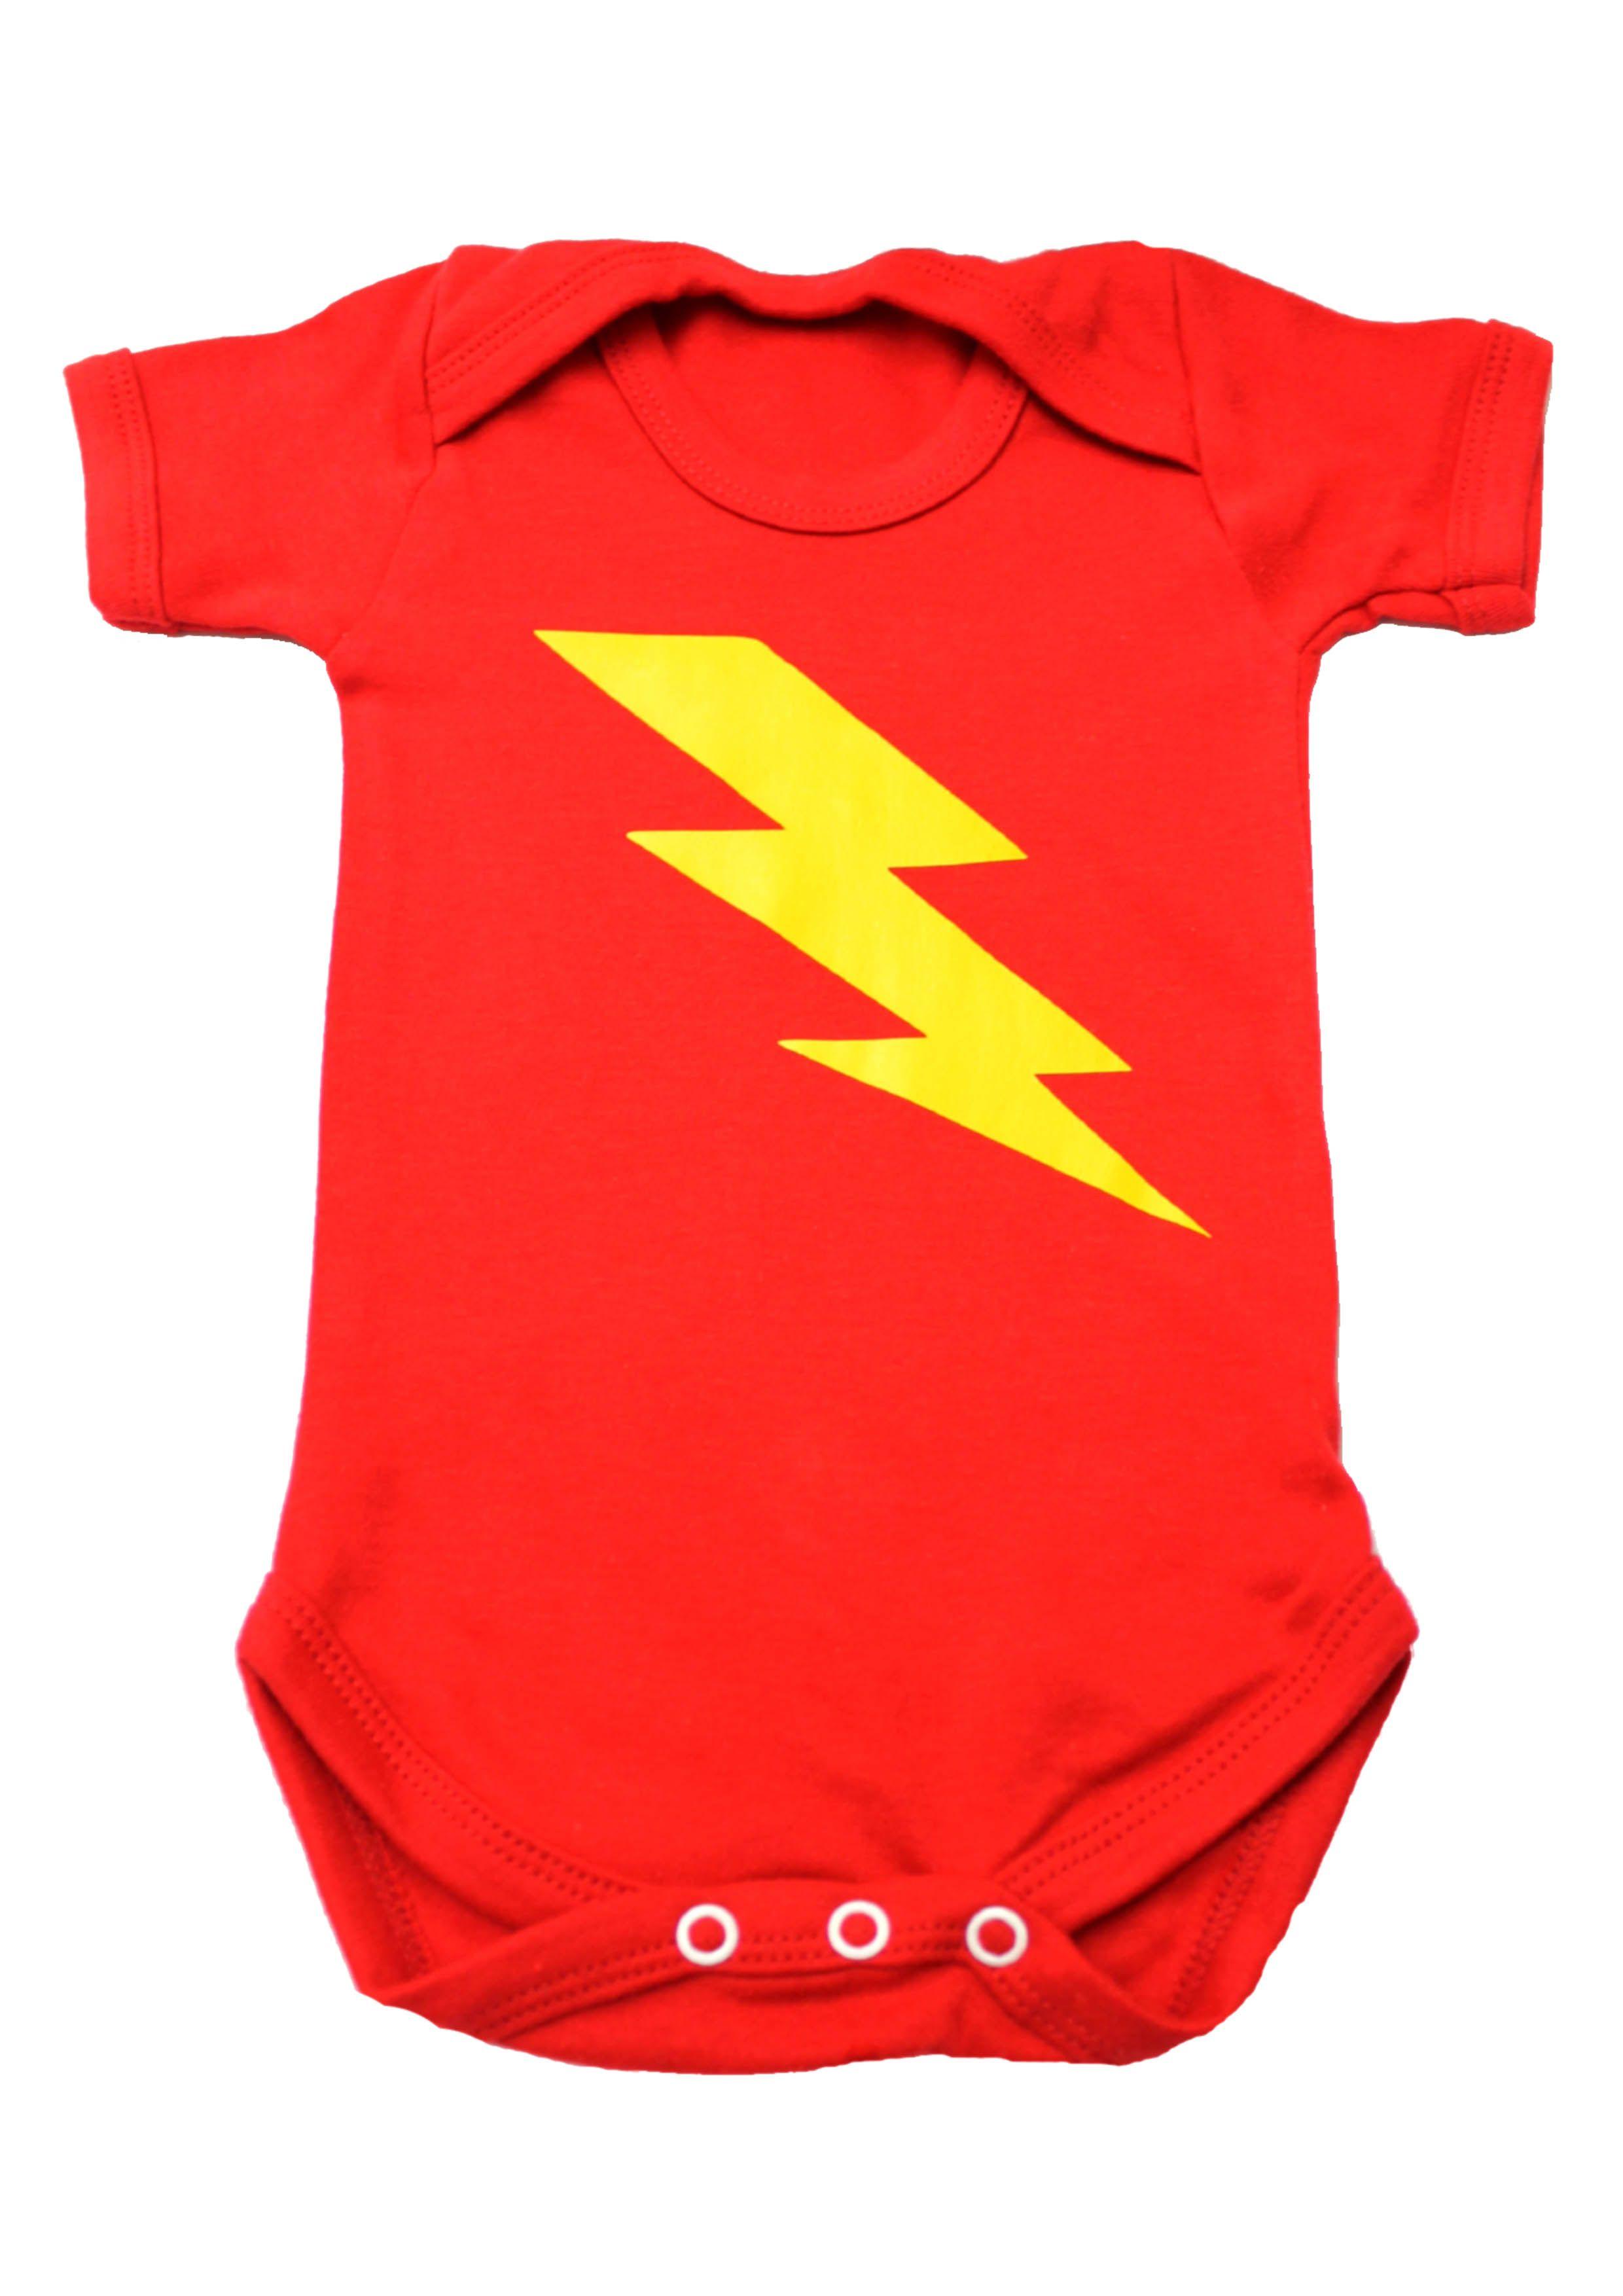 Superhero Flash Baby Grow Funky Baby Clothes Superhero And Babies